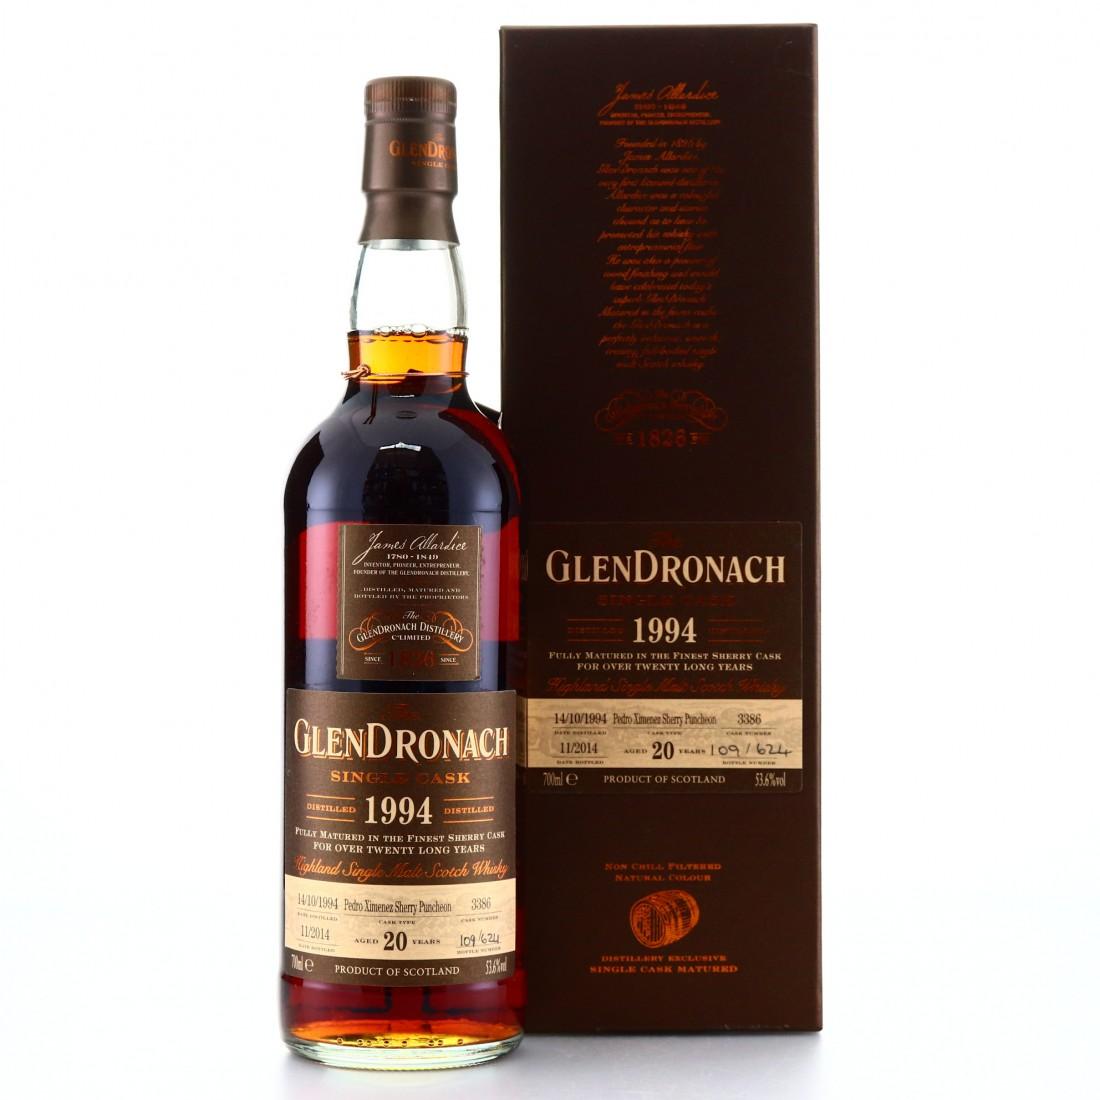 Glendronach 1994 Single Cask 20 Year Old #3386